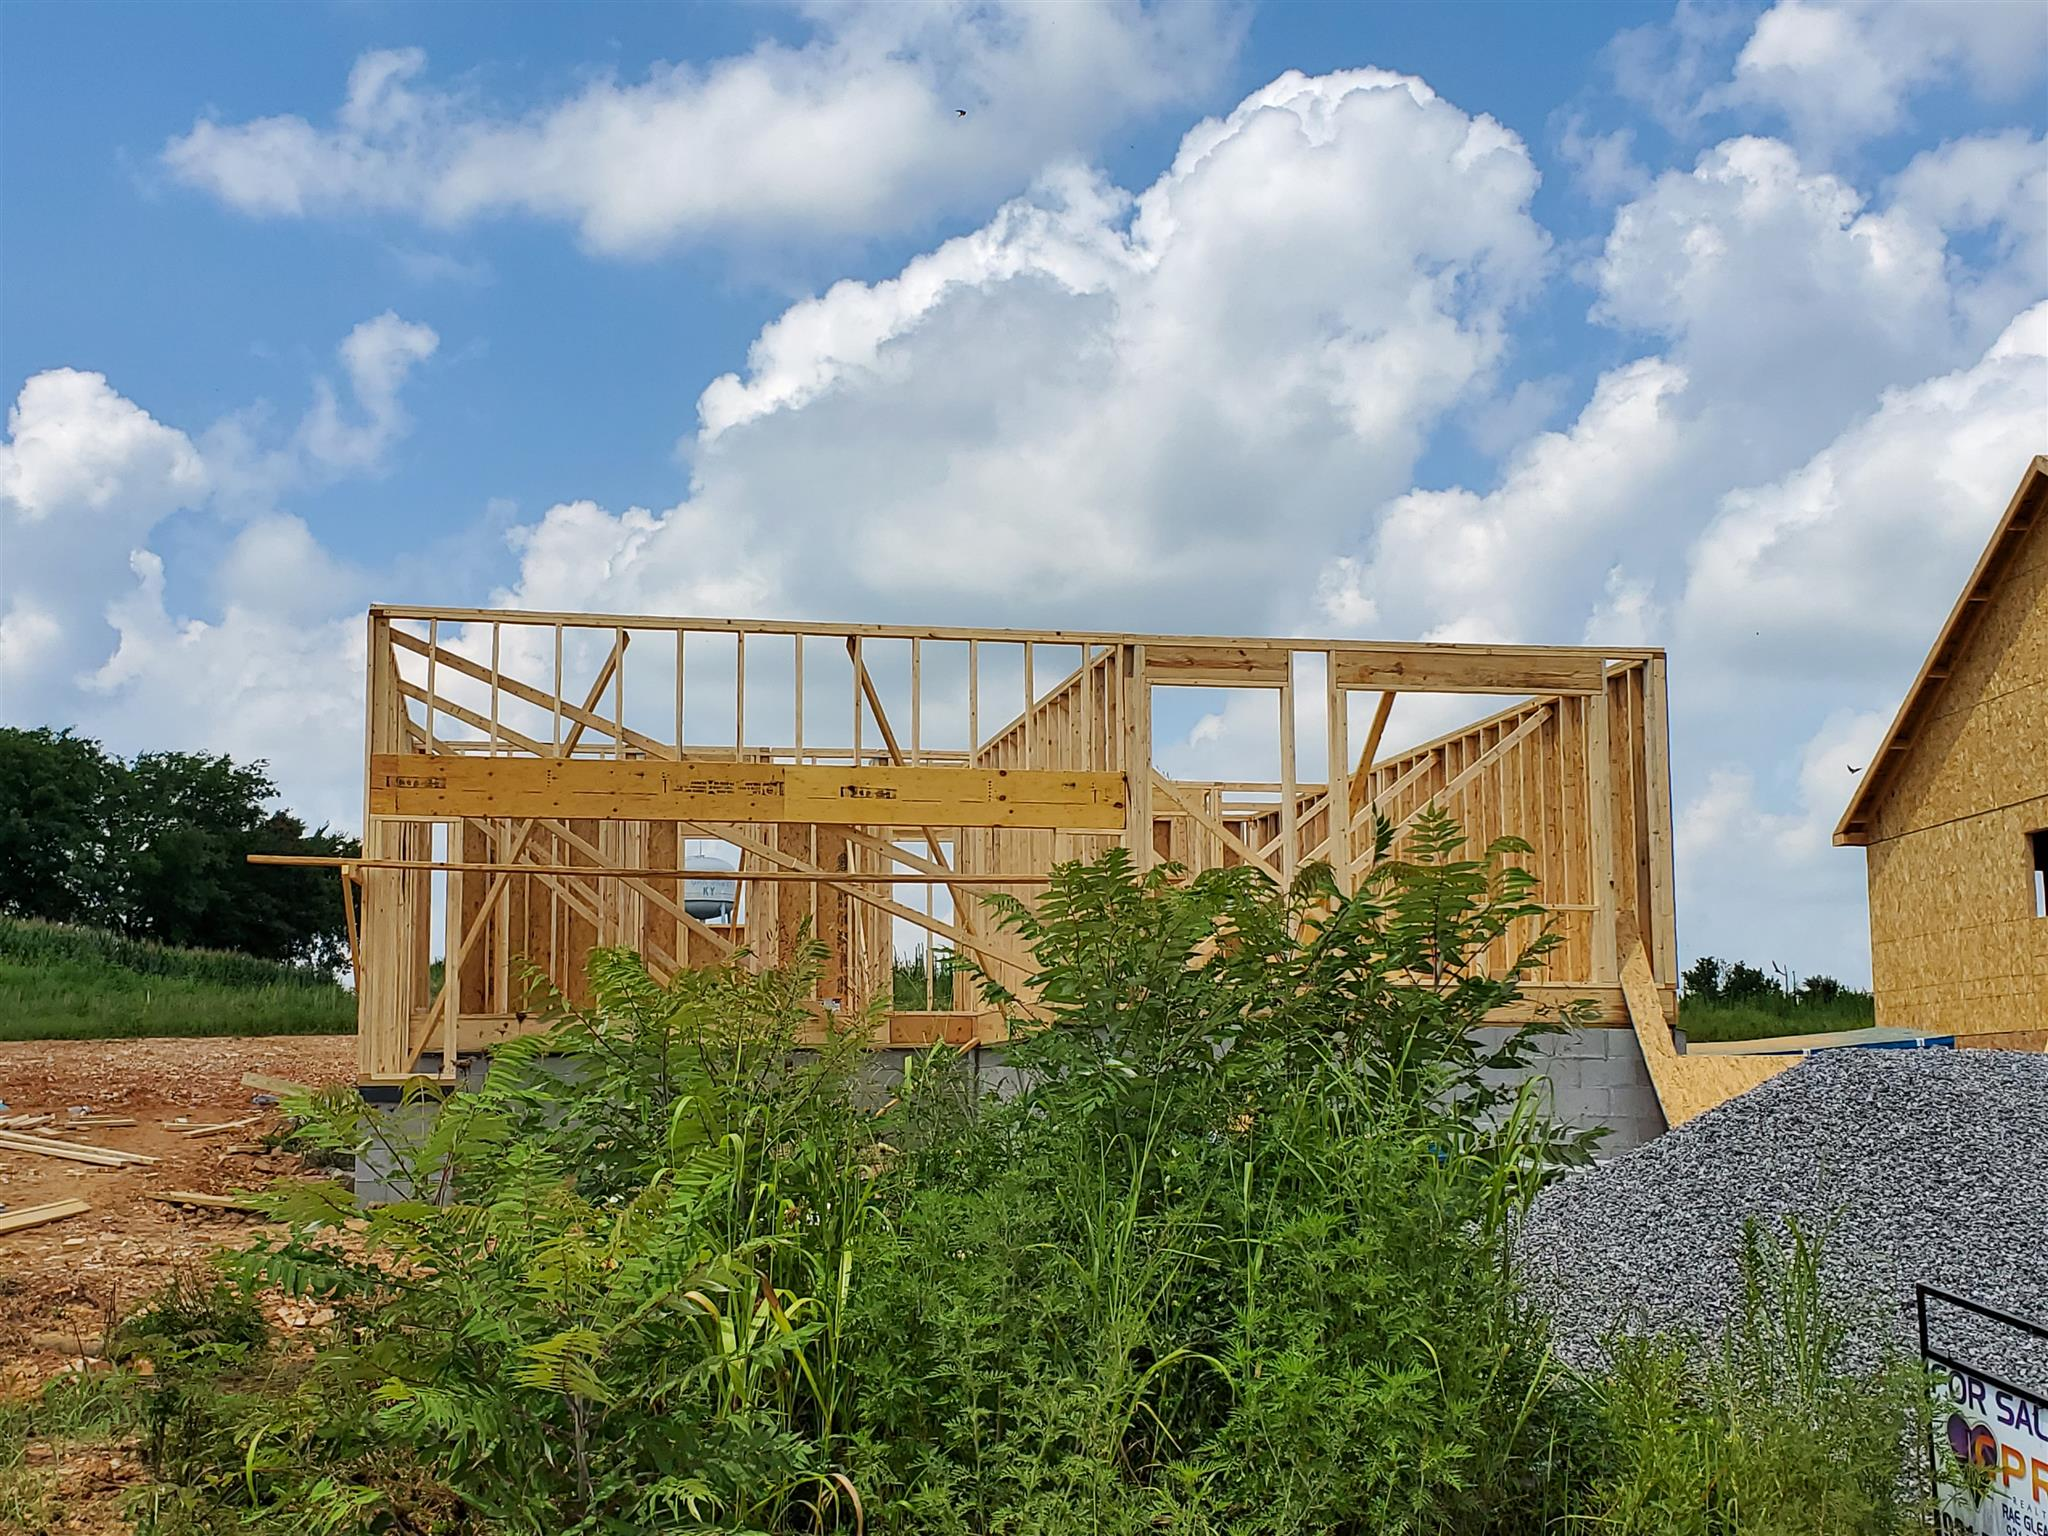 138 Ambridge Street (Lot 15), Oak Grove, KY 42262 - Oak Grove, KY real estate listing